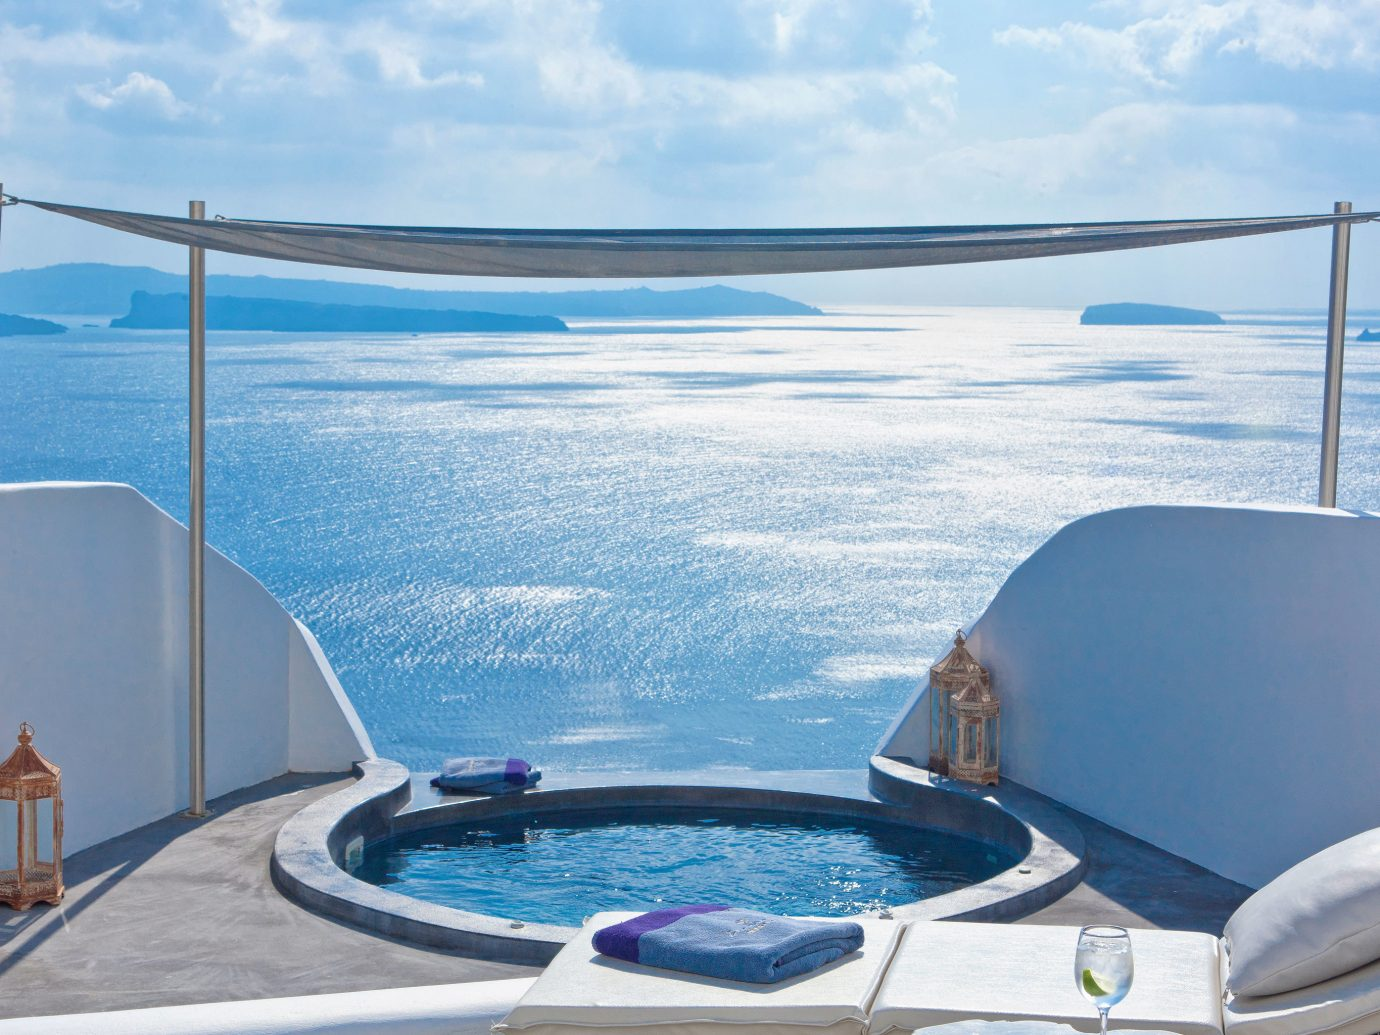 Balcony Clic Elegant Greece Hot Tub Jacuzzi Hotels Island Luxury Santorini Scenic Views Suite